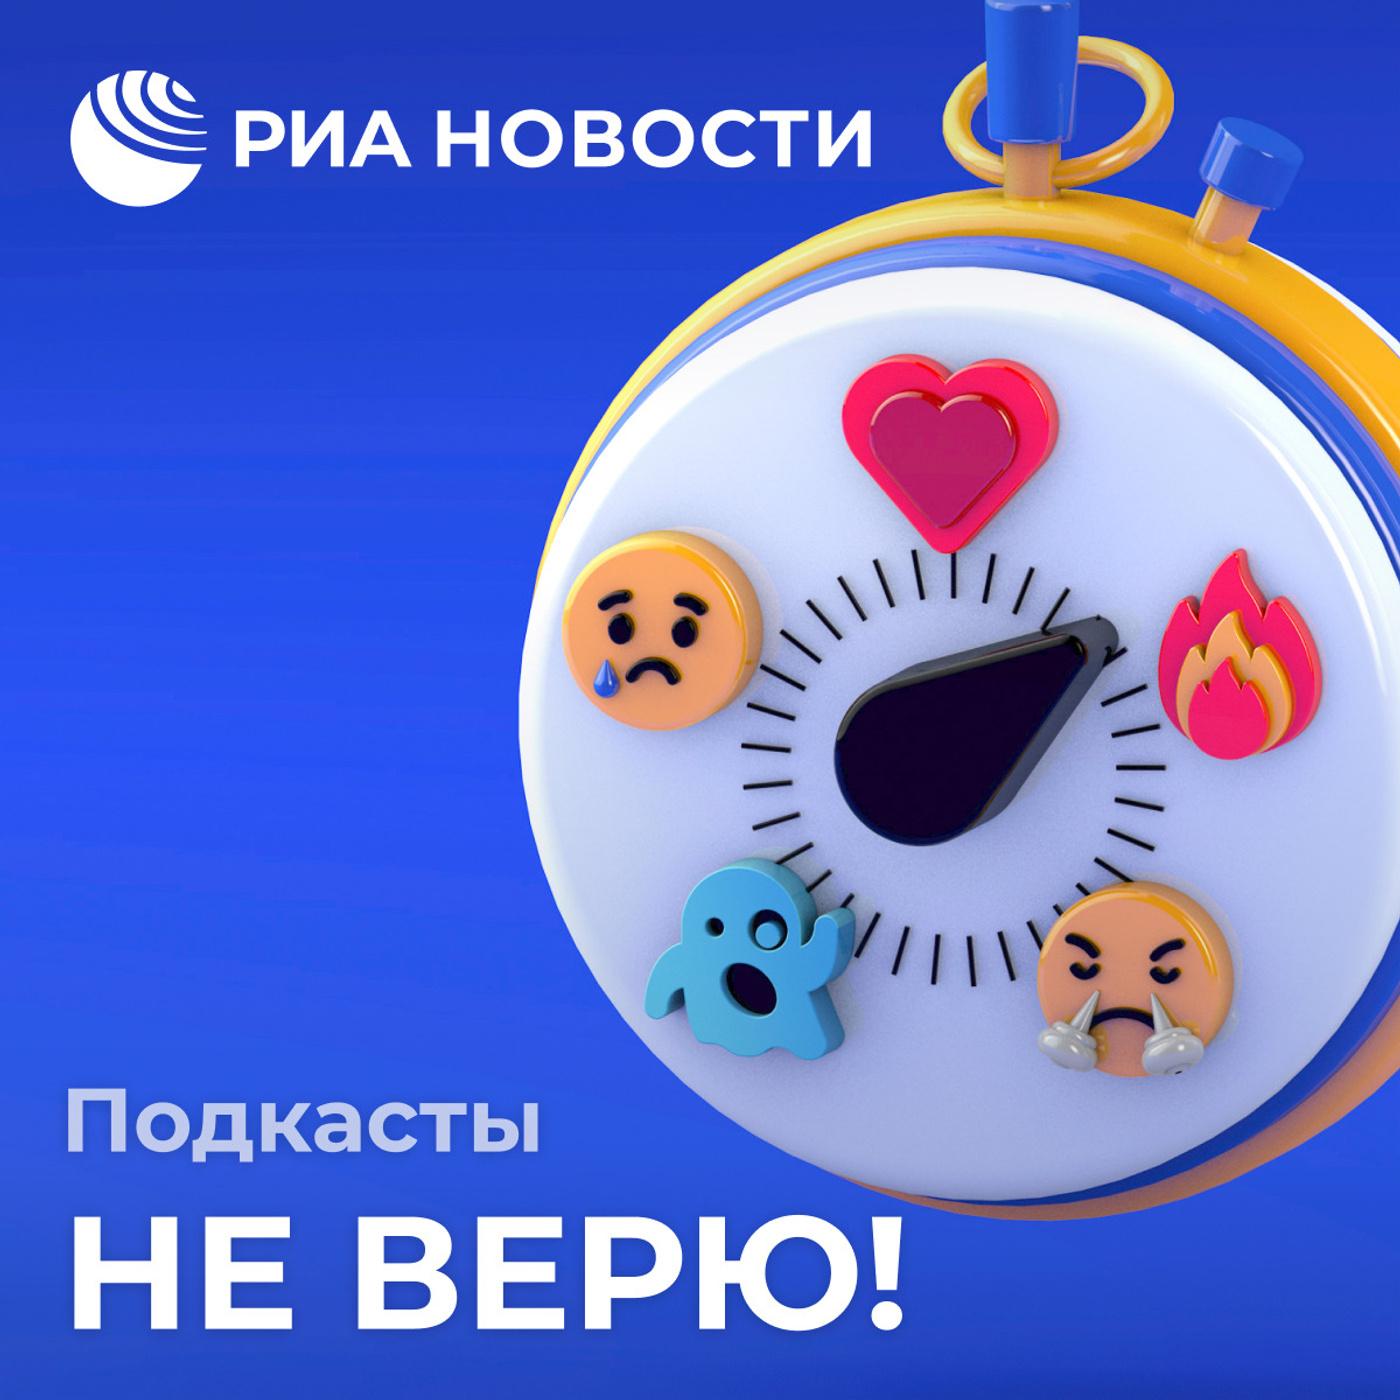 Отрава на детских площадках, рубашка Путина, как выглядел Петр I